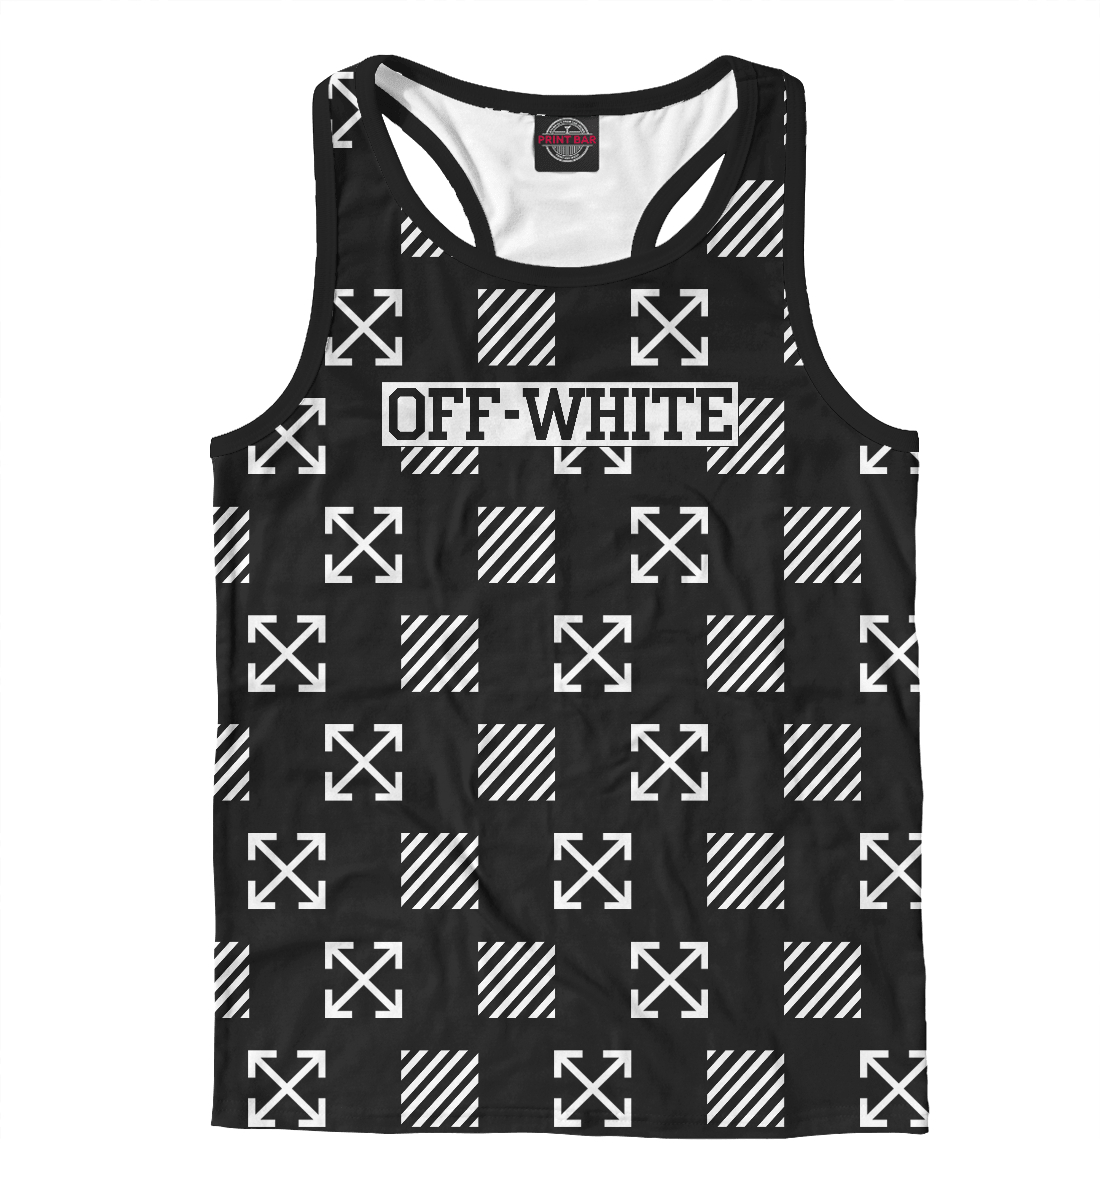 Купить Off-White, Printbar, Майки борцовки, APD-366281-mayb-2